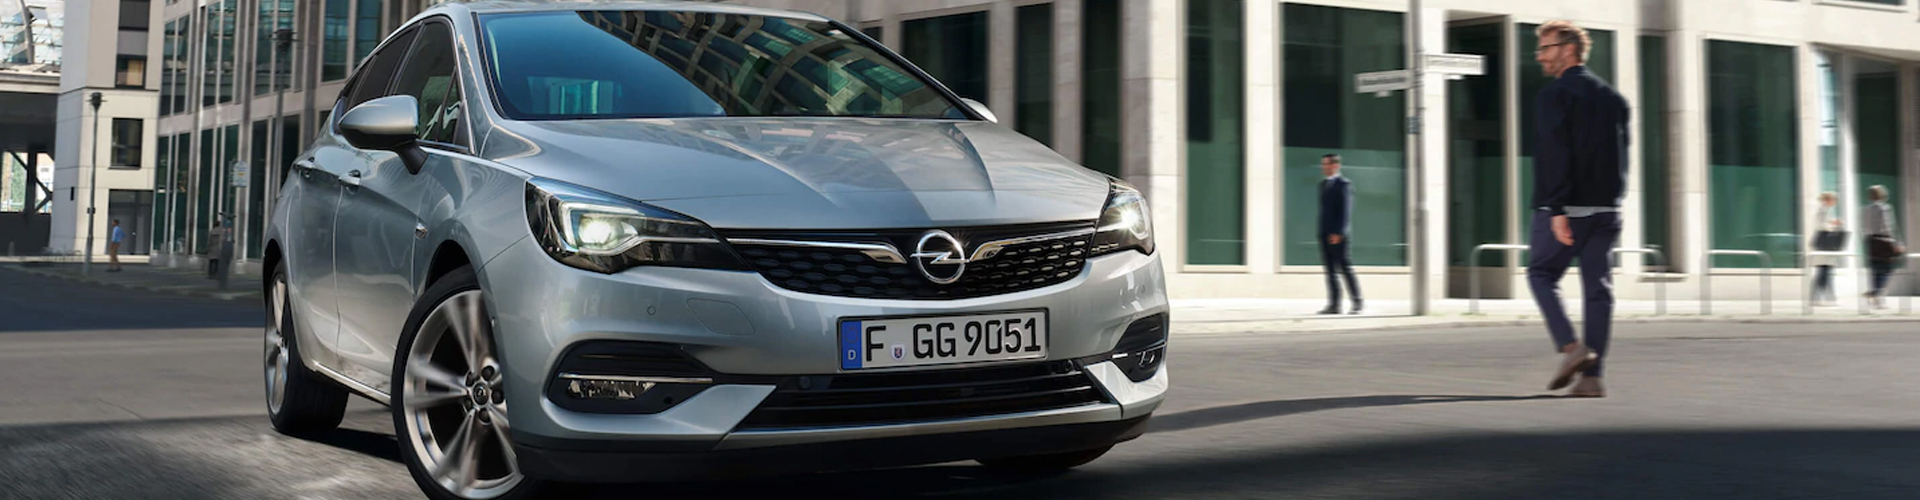 Opel Astra Hb Elegance 1 5 Dizel At 9 122 Hp Ozellikleri